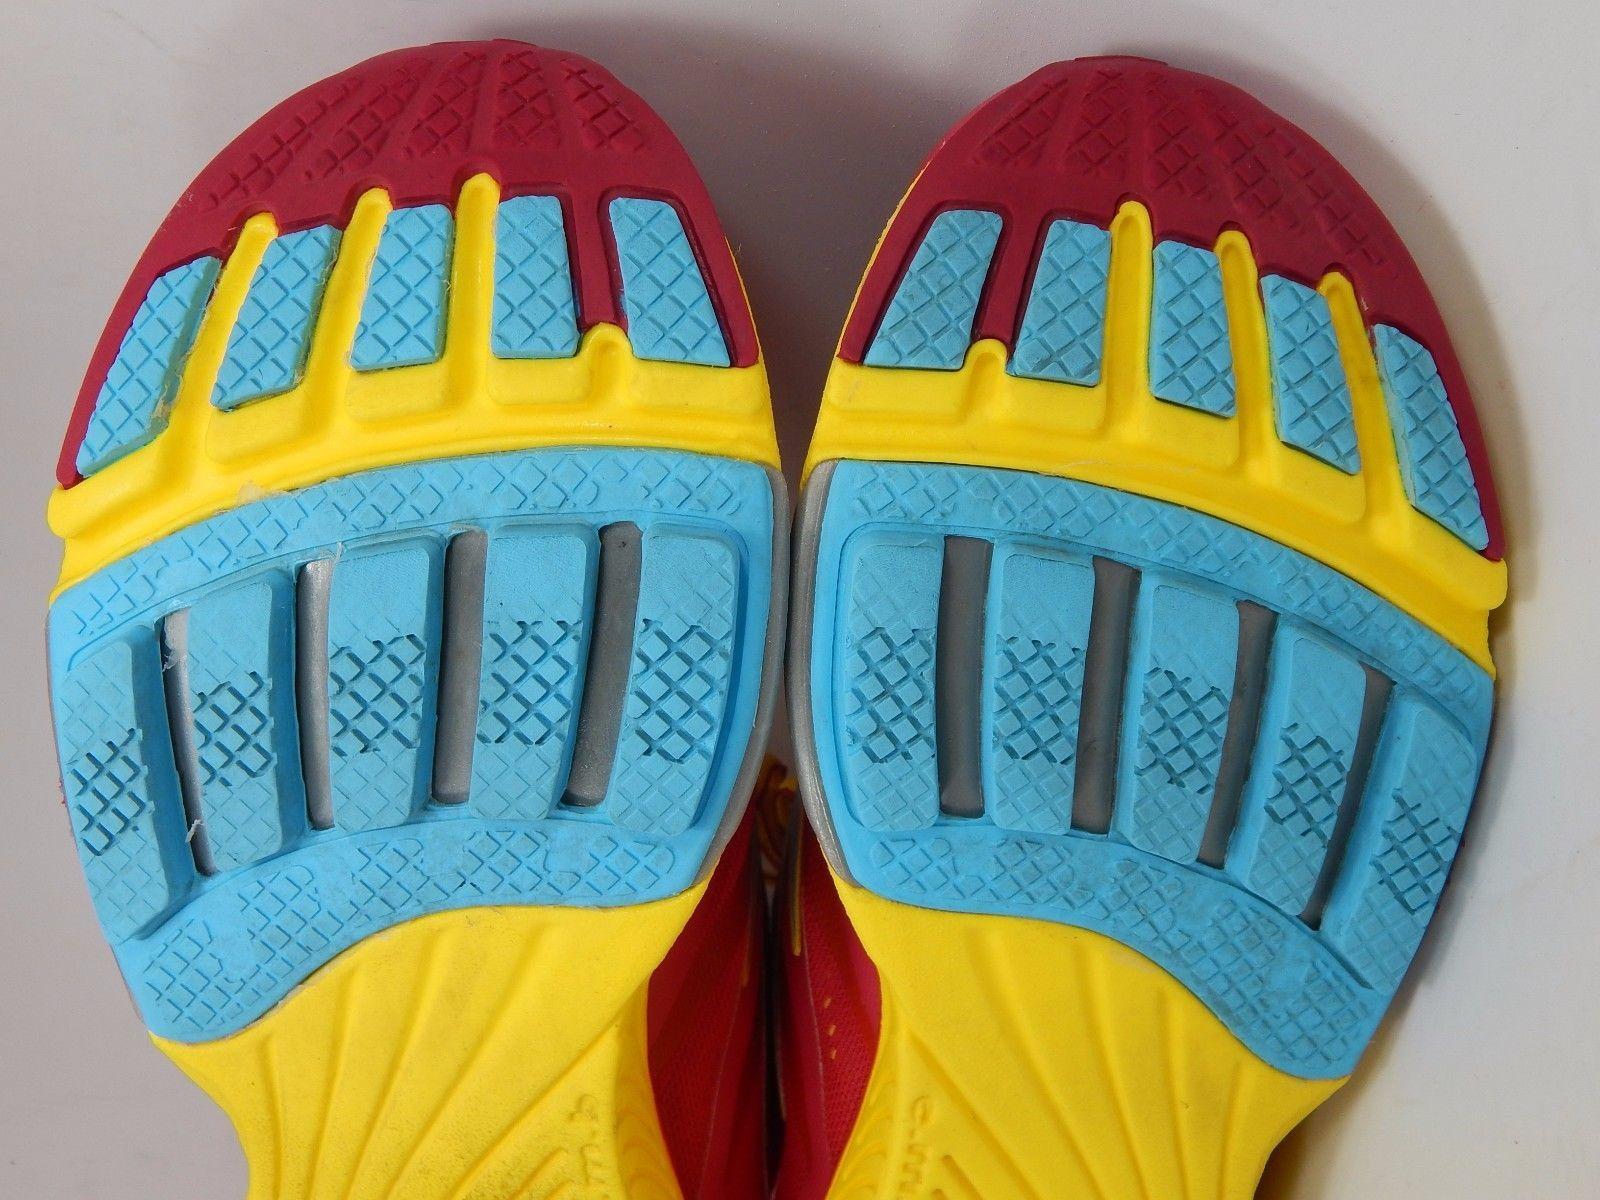 Newton Motion IV 4 Women's Running Shoes Size US 10.5 M (B) EU 42 Red W000415